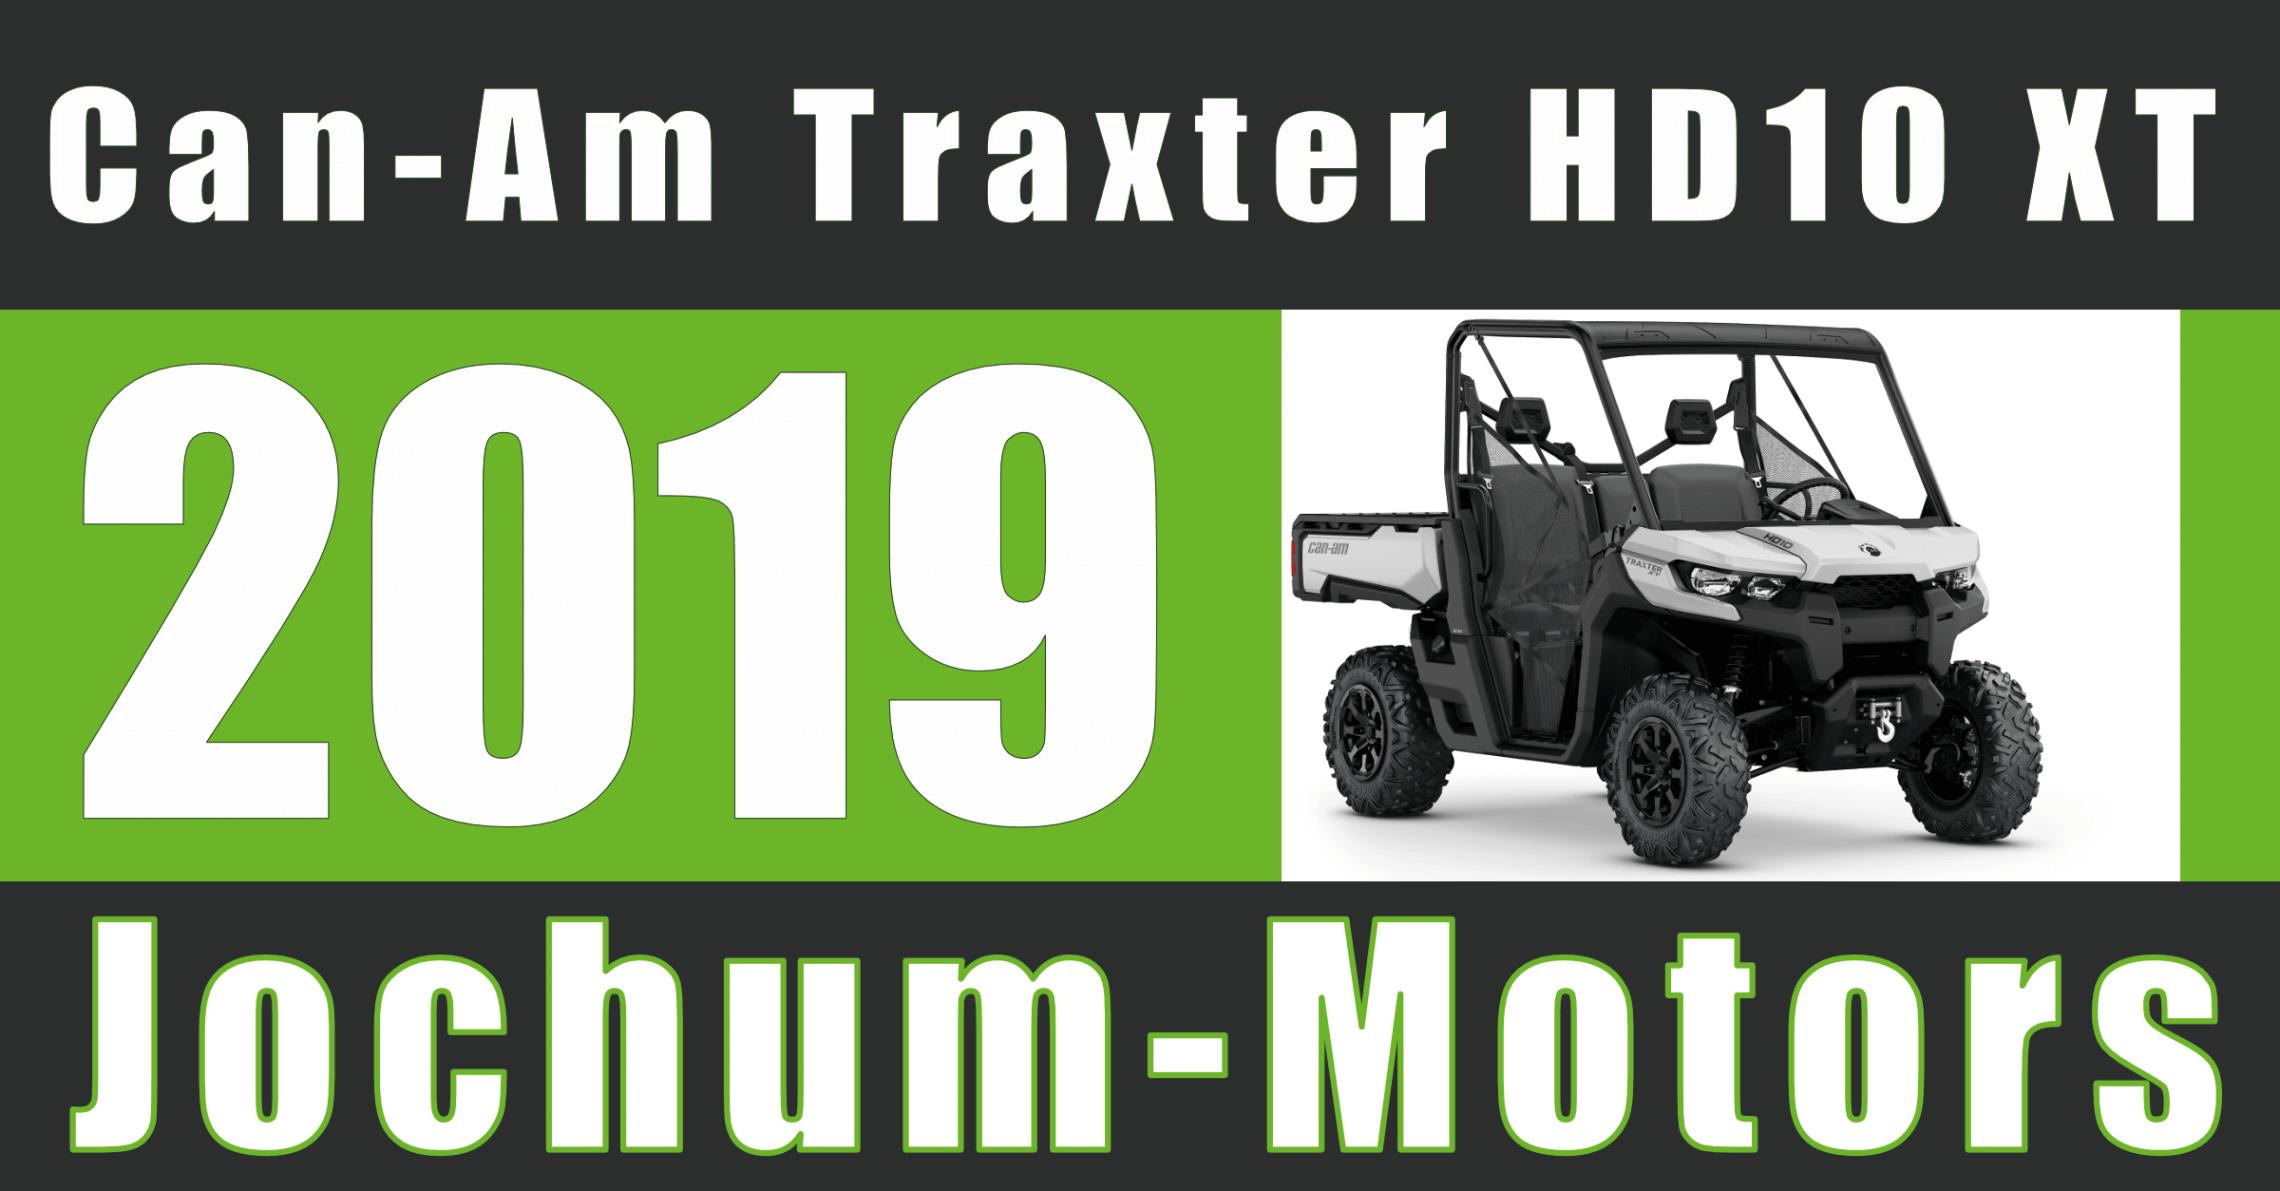 Can-Am Traxter HD10 XT